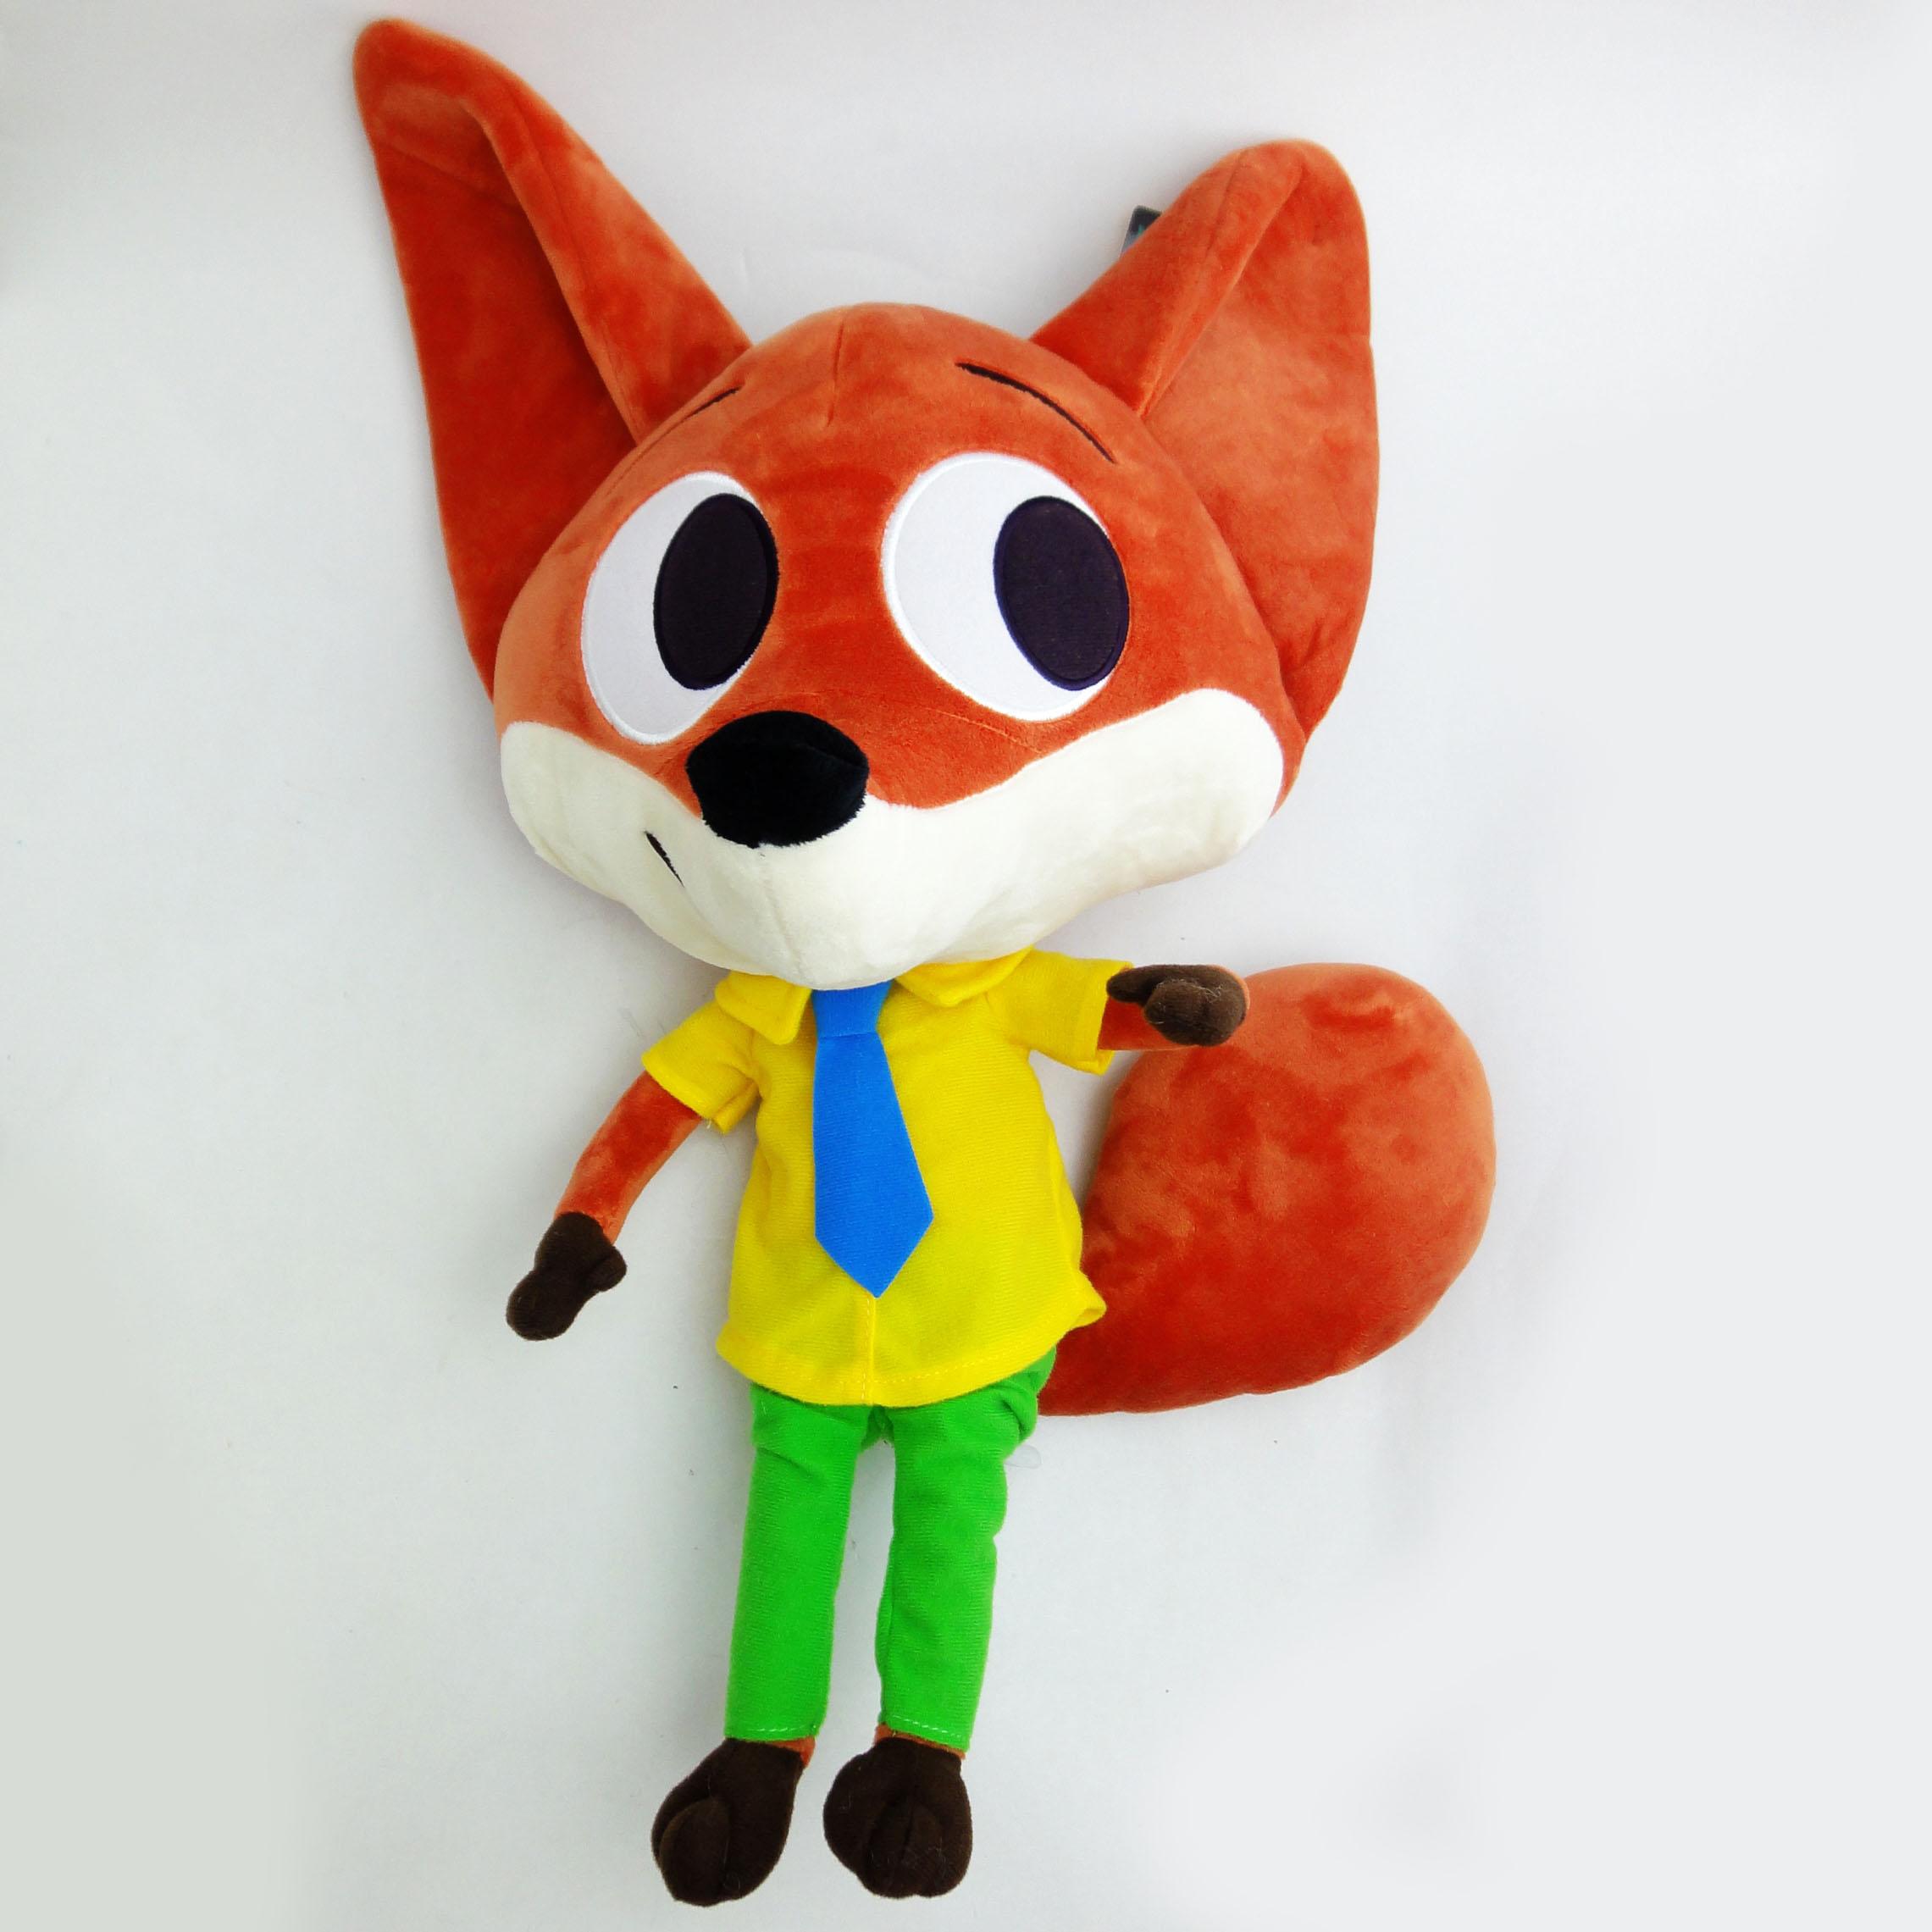 【UNIPRO】迪士尼 動物方城市 Zootopia 胡 尼克 Nick Q版 帥氣 狐狸 赤狐 玩偶 55公分 絨毛娃娃